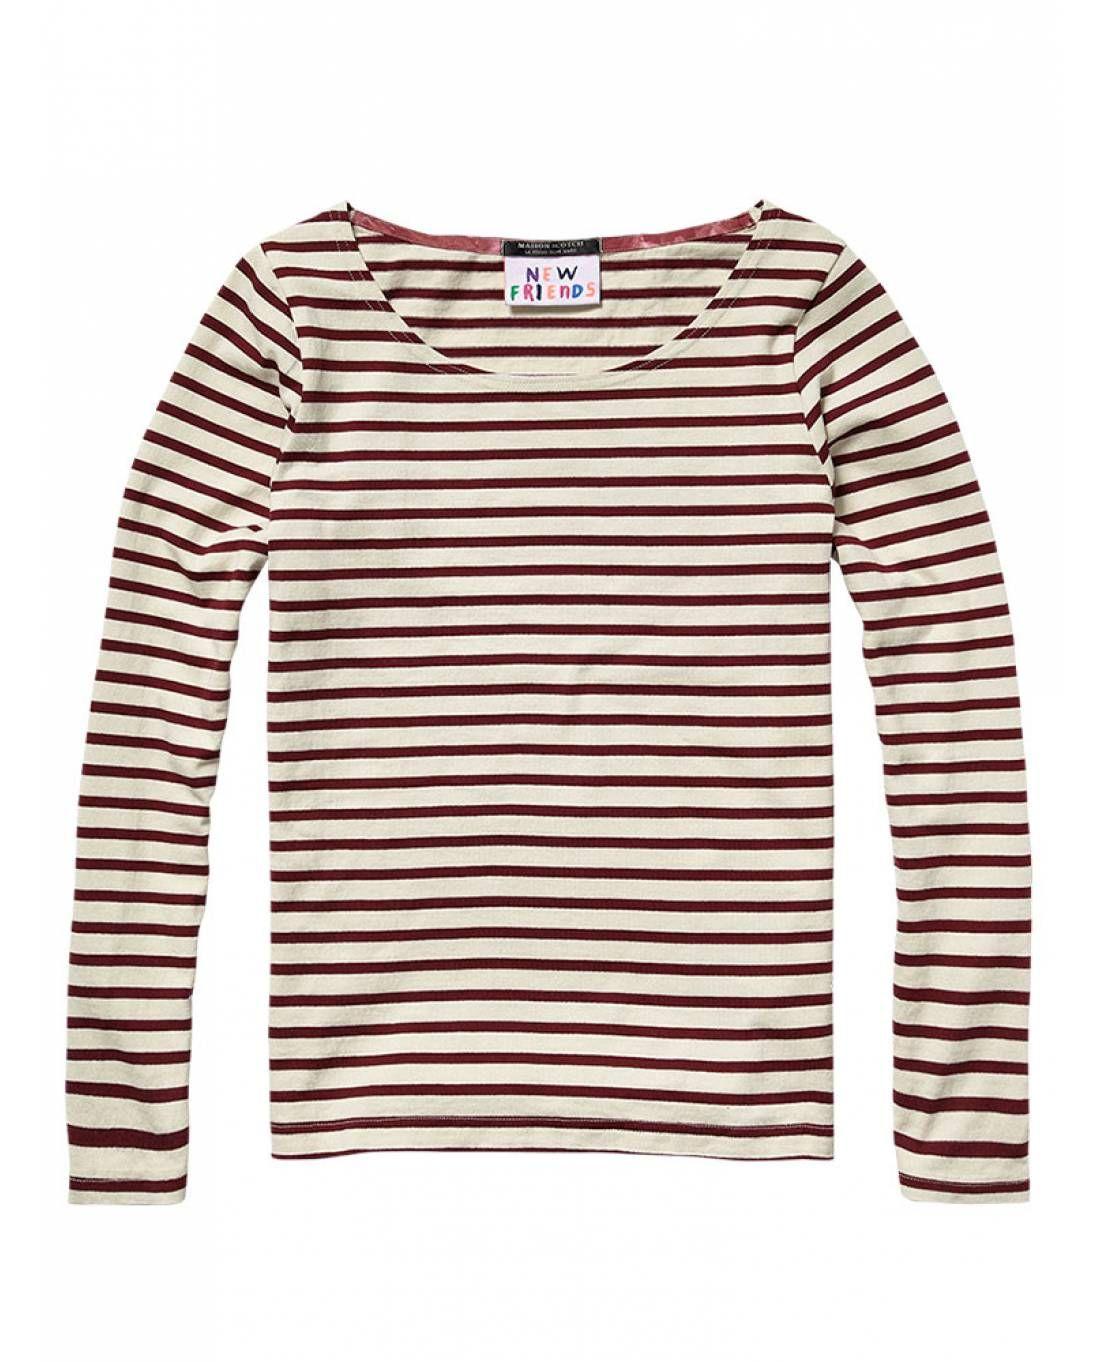 Breton stripe shirt with zipped cuffs by Maison Scotch   Fashion dff28376965f